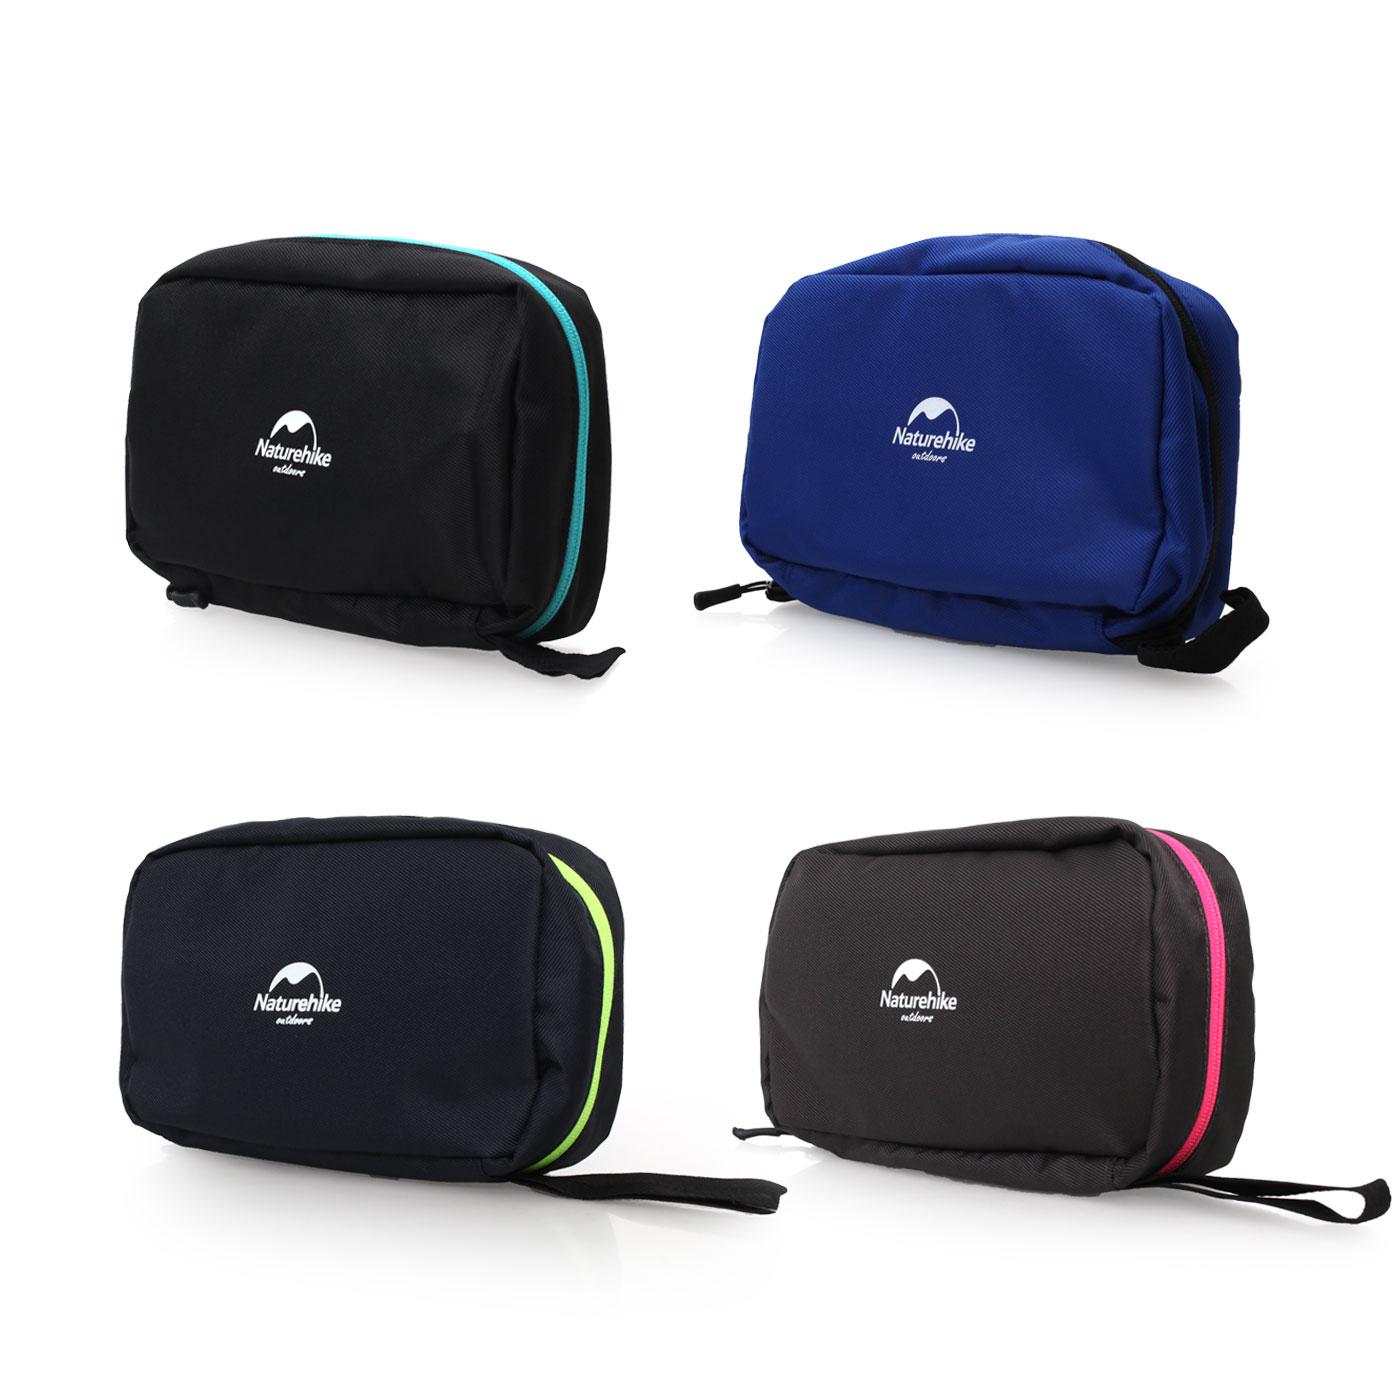 NatureHike 輕便旅行盥洗包-升級版Ⅱ 6021101